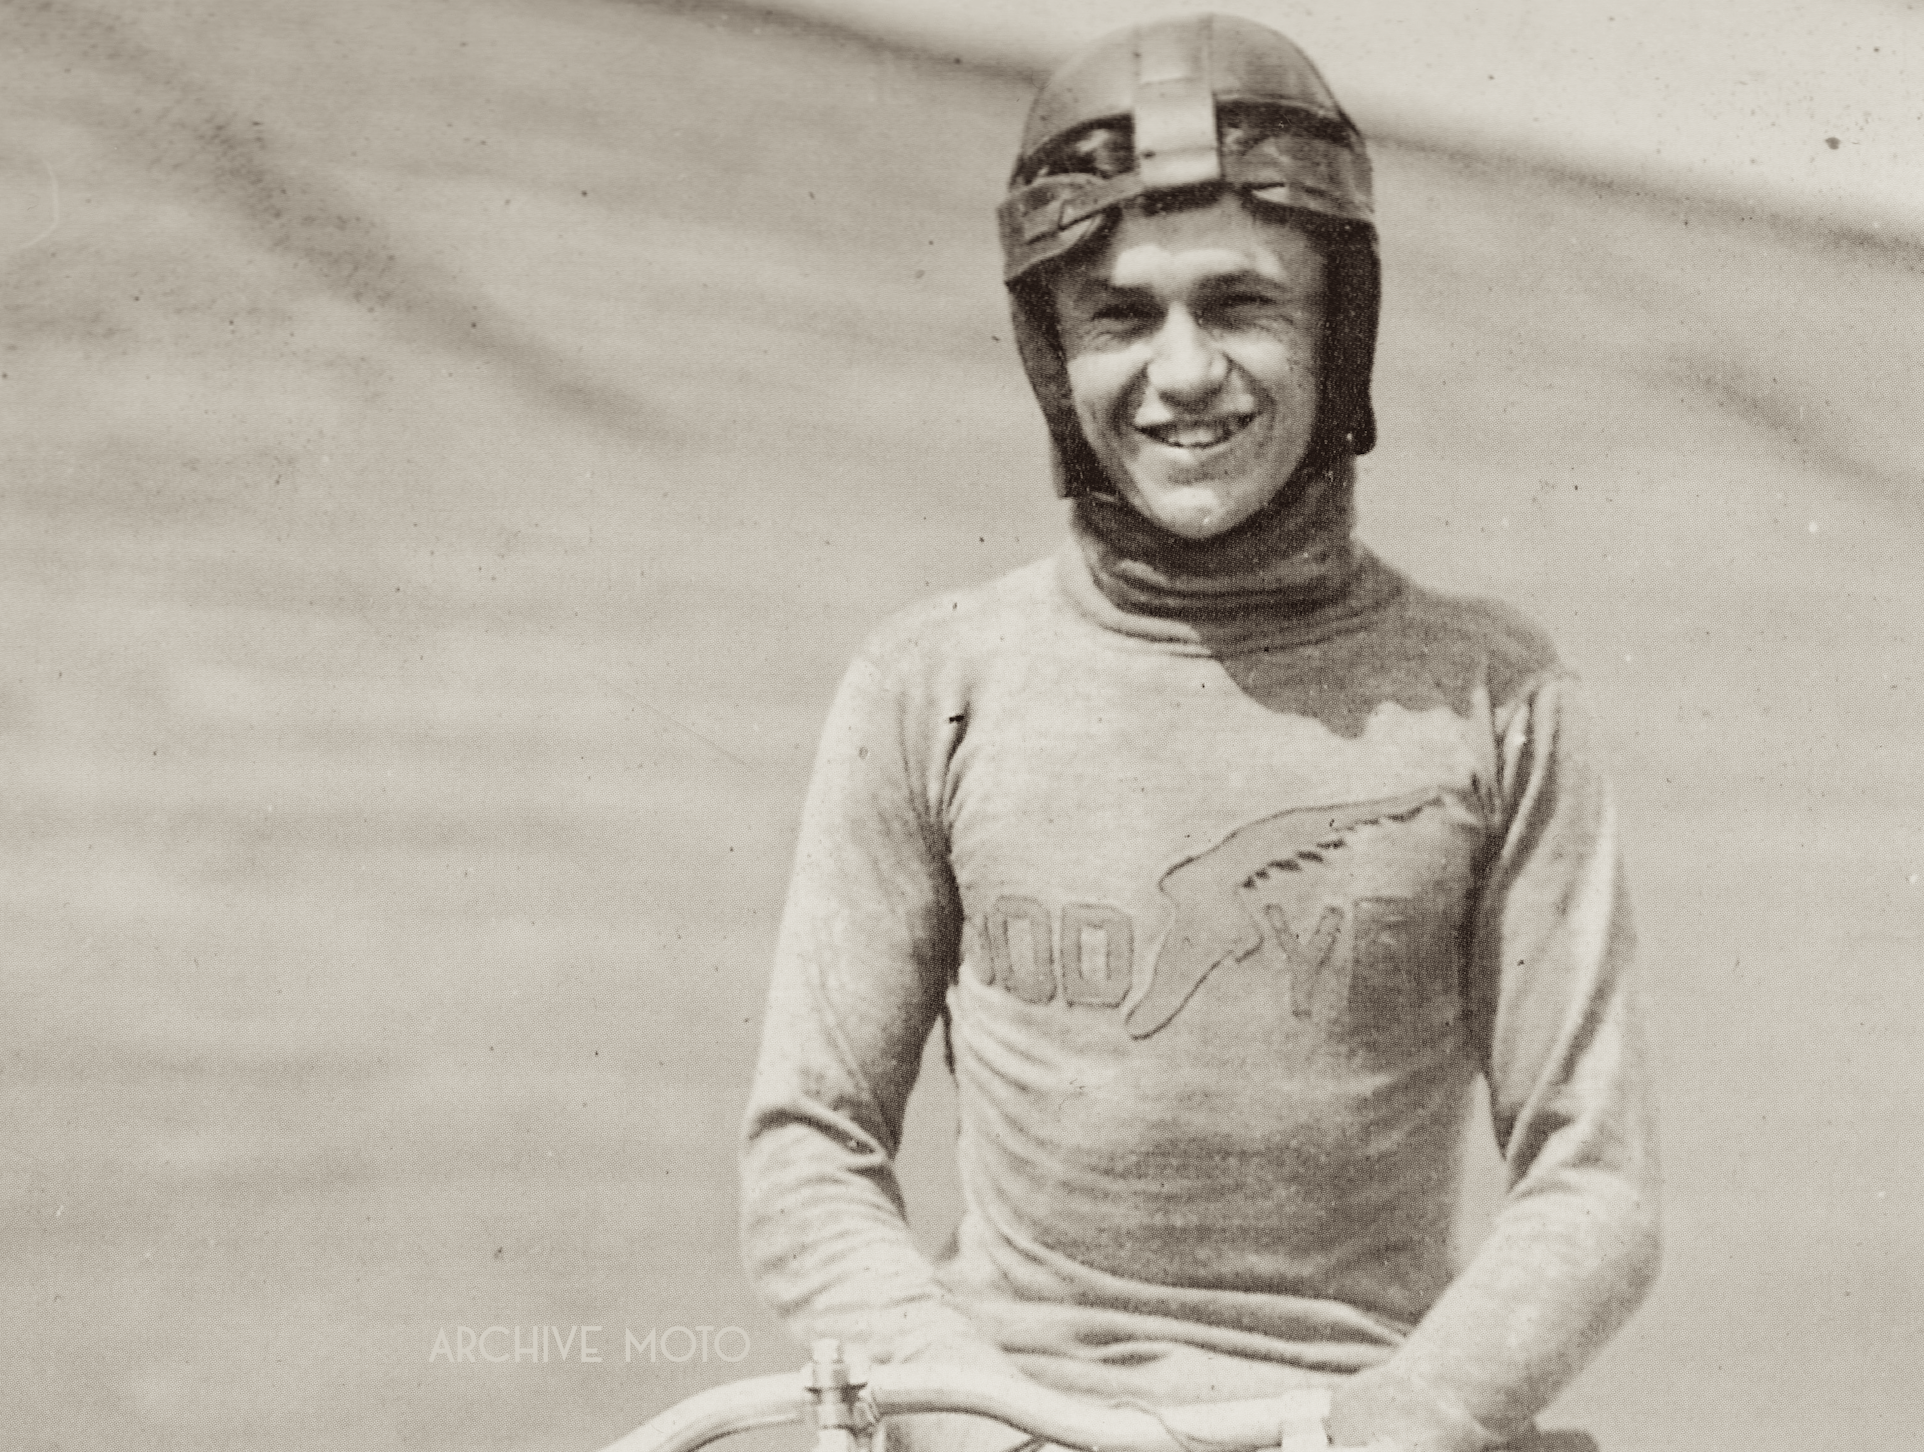 William Edward Hasha sporting a GoodYear racing jersey during the 1912 season.